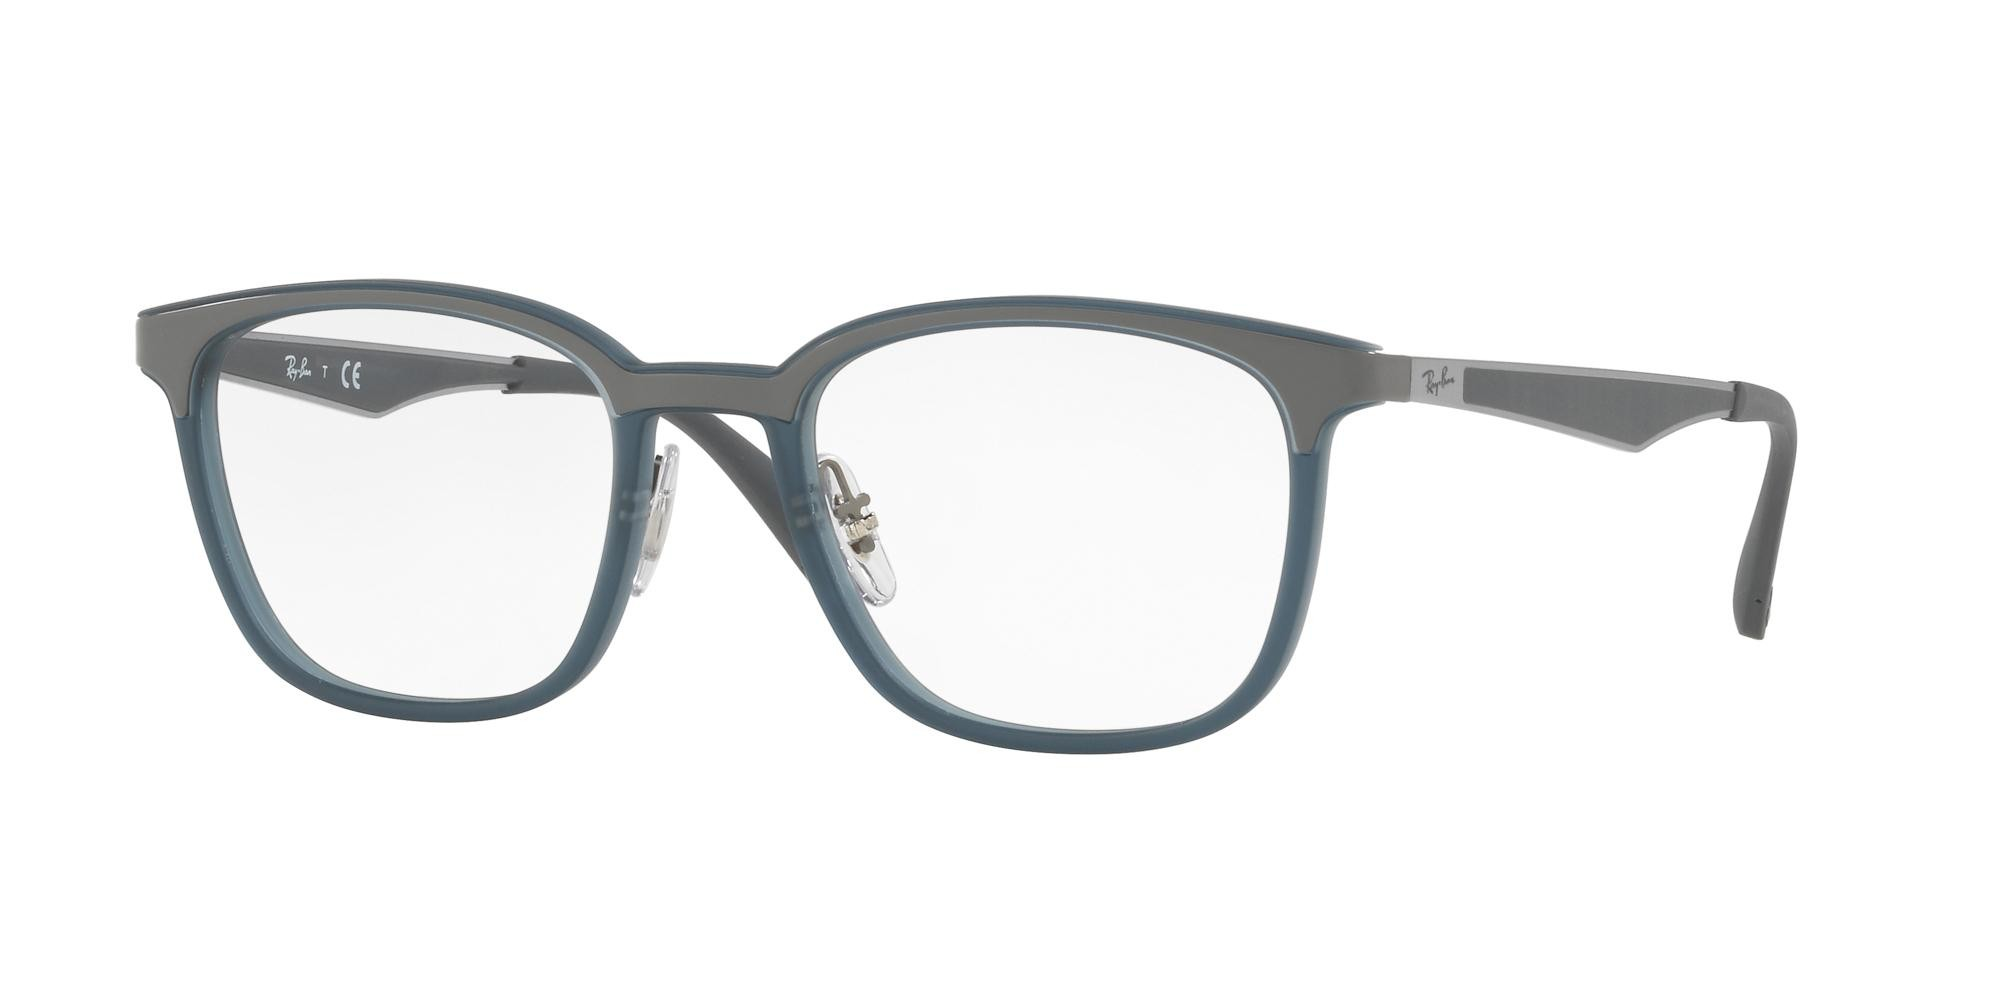 Ray-Ban eyeglasses RX 7117